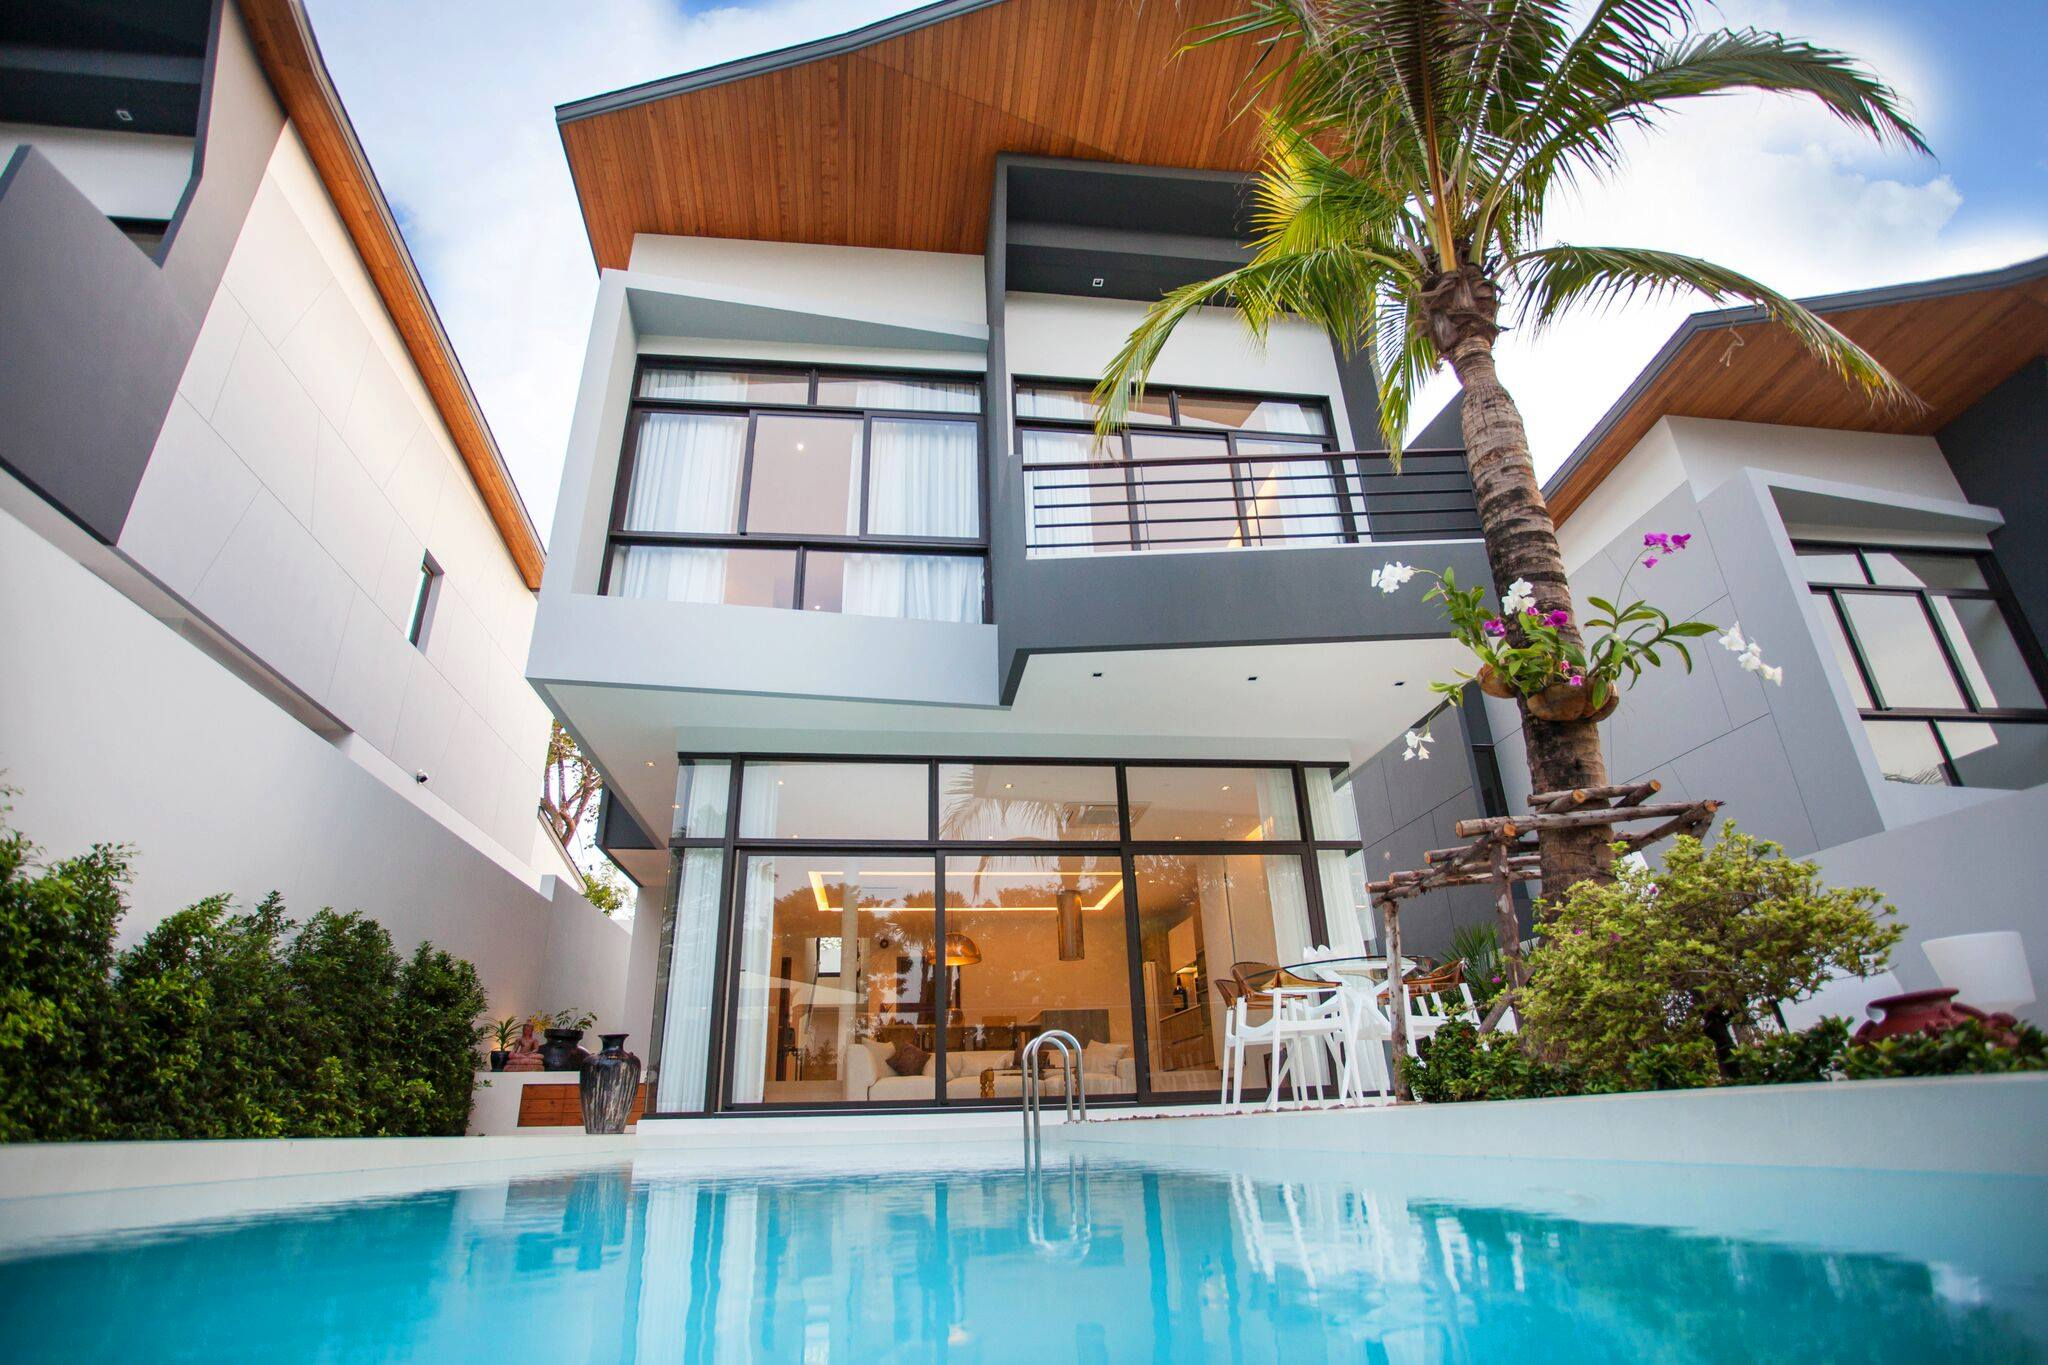 Phuket Real Estate Agency – Nai Harn Beach (45)